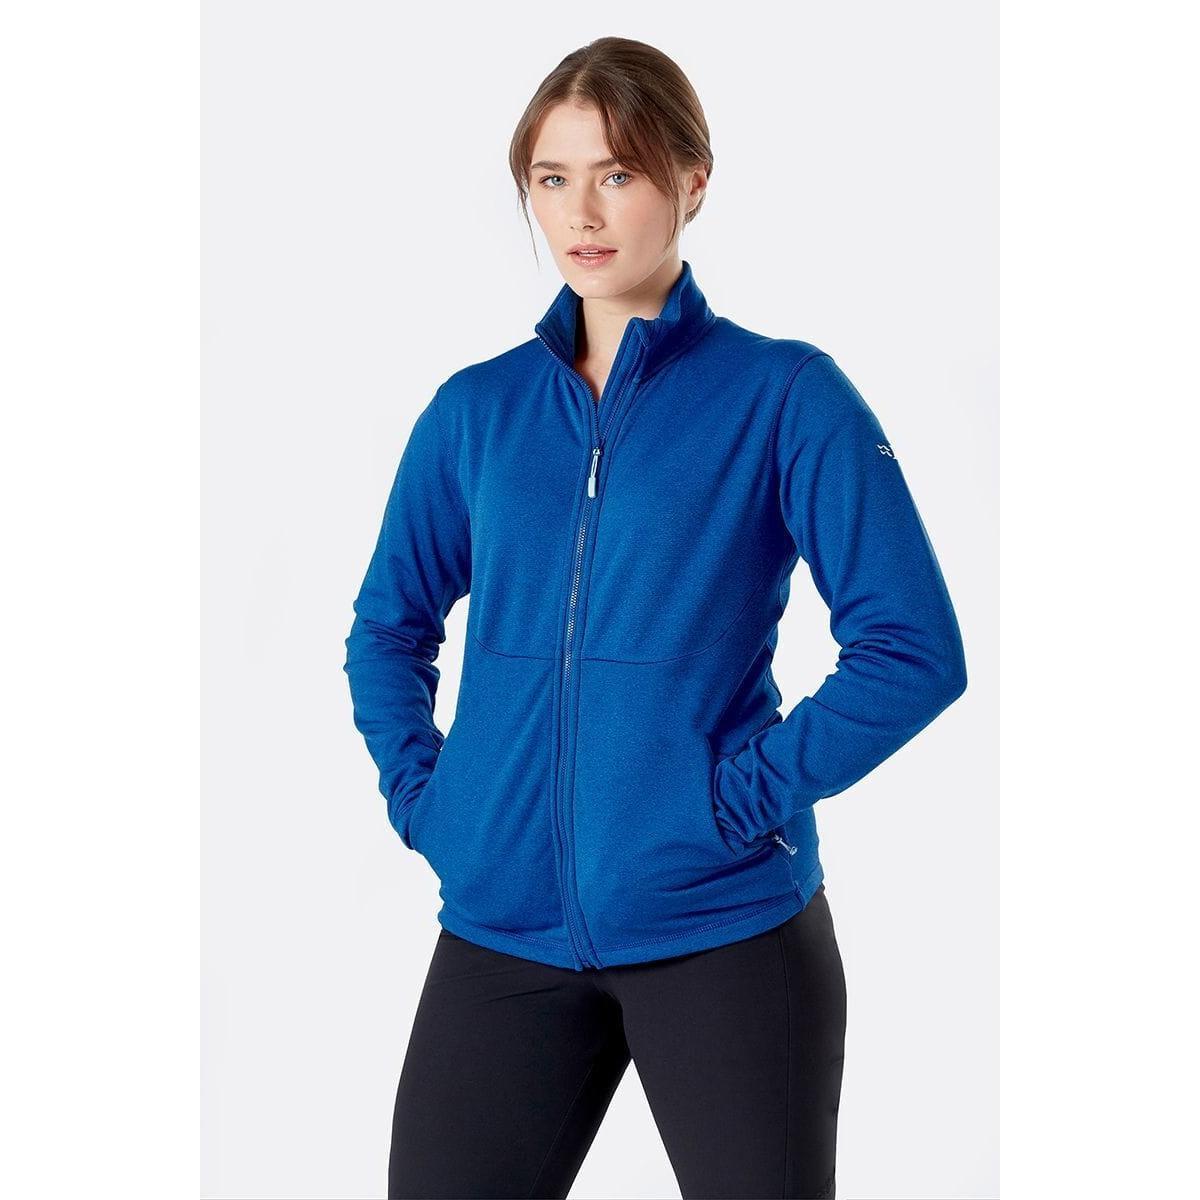 Rab Women's Rab Geon Fleece Jacket - Blue